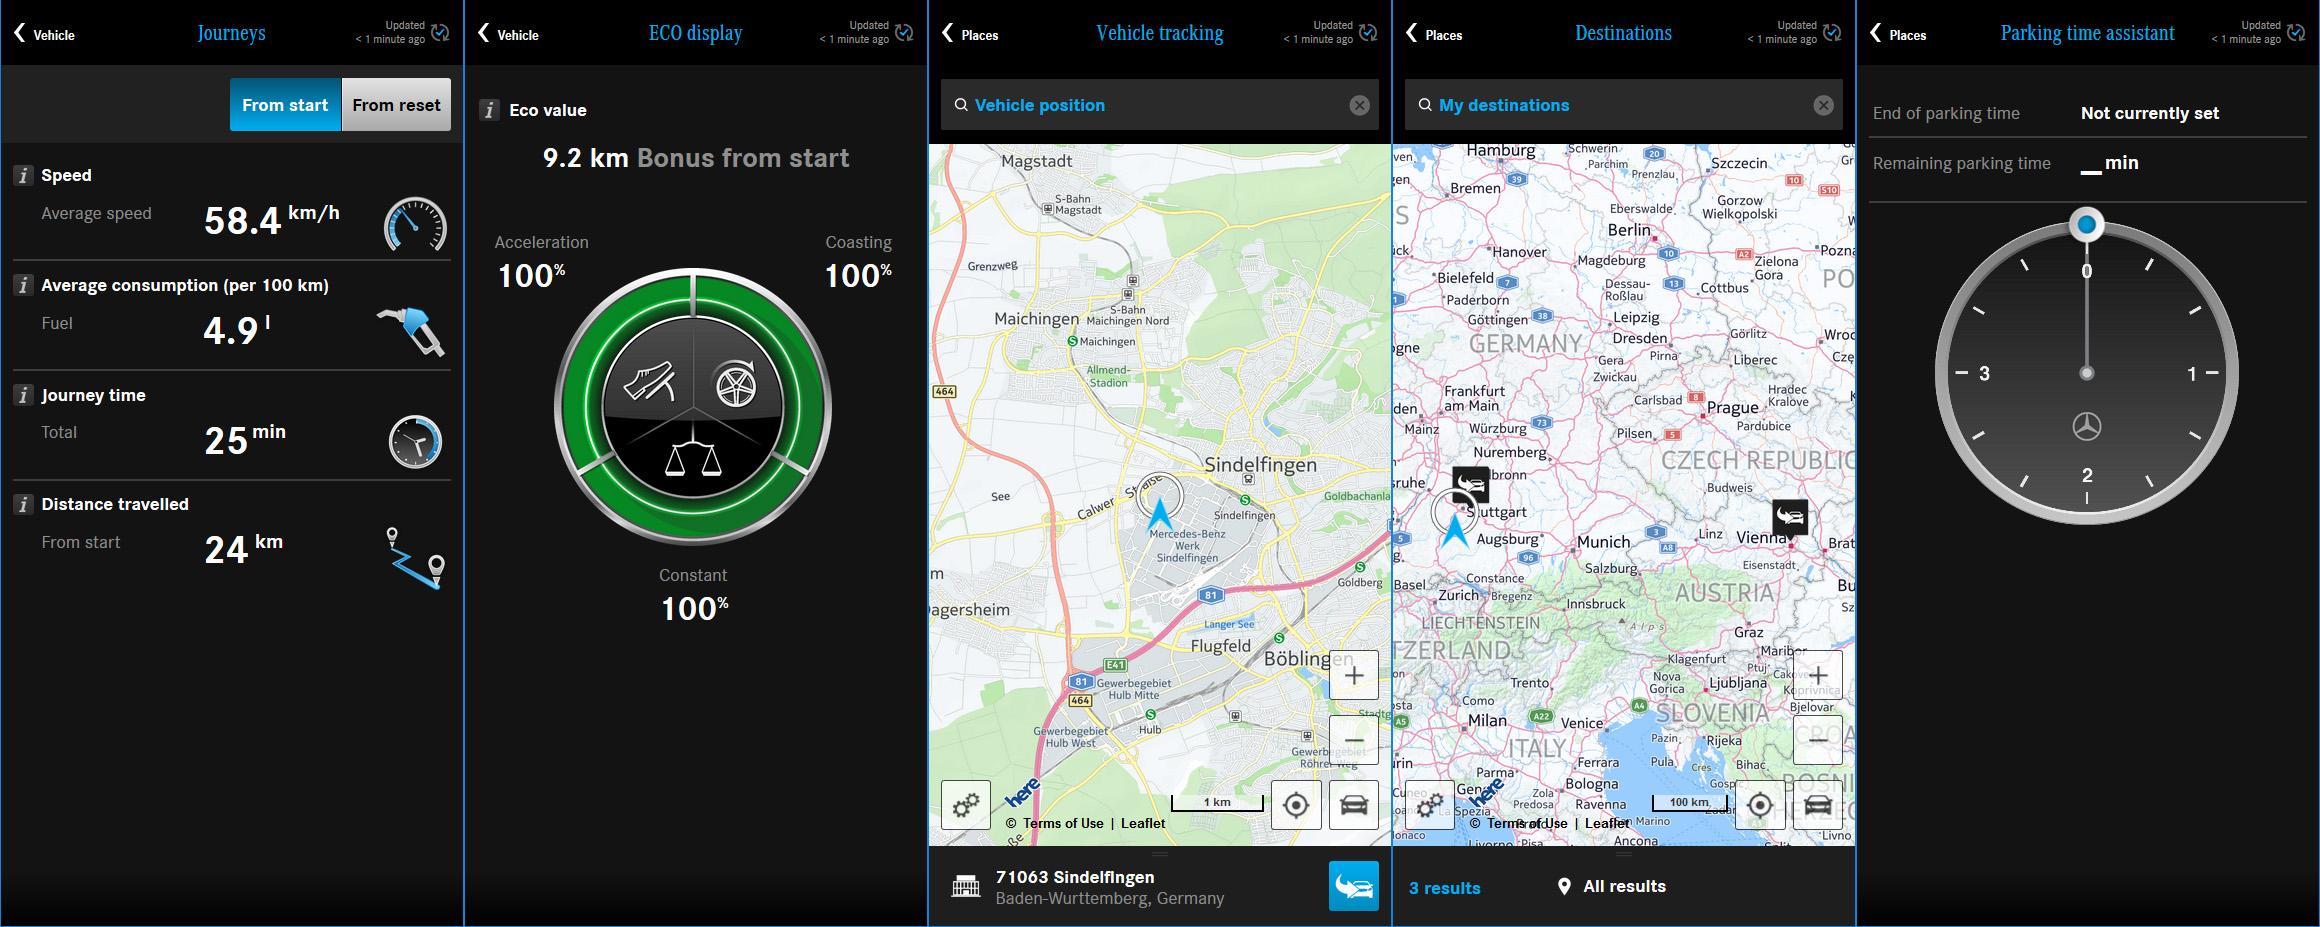 Mercedes-Benz-daimler-pivotal-car-app-v2